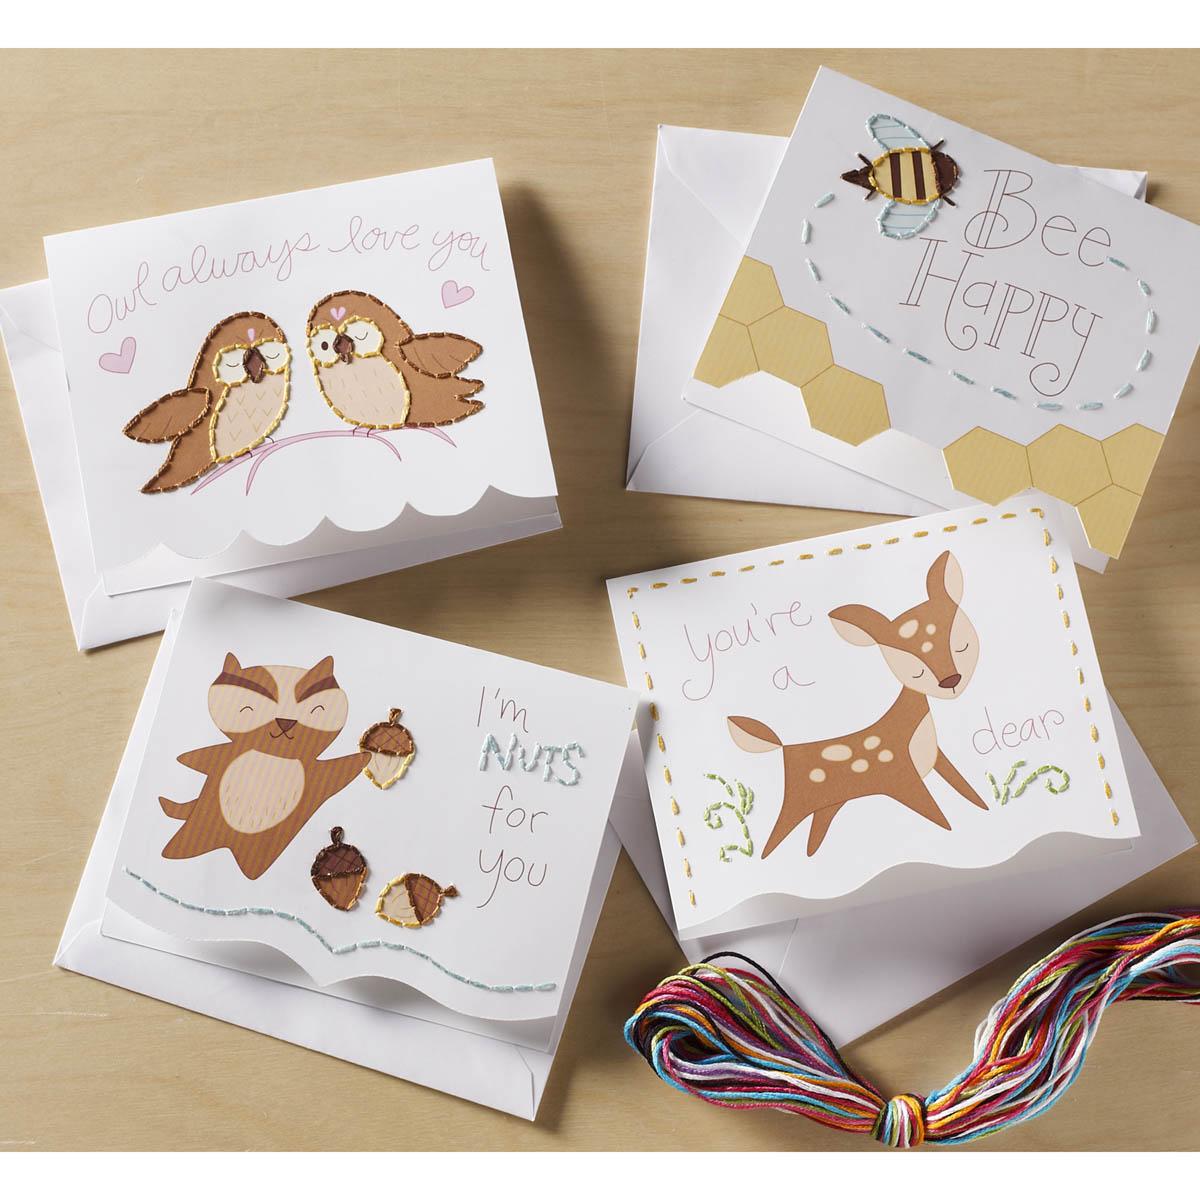 Bucilla ® Paper Stitching - Note Cards - Nature